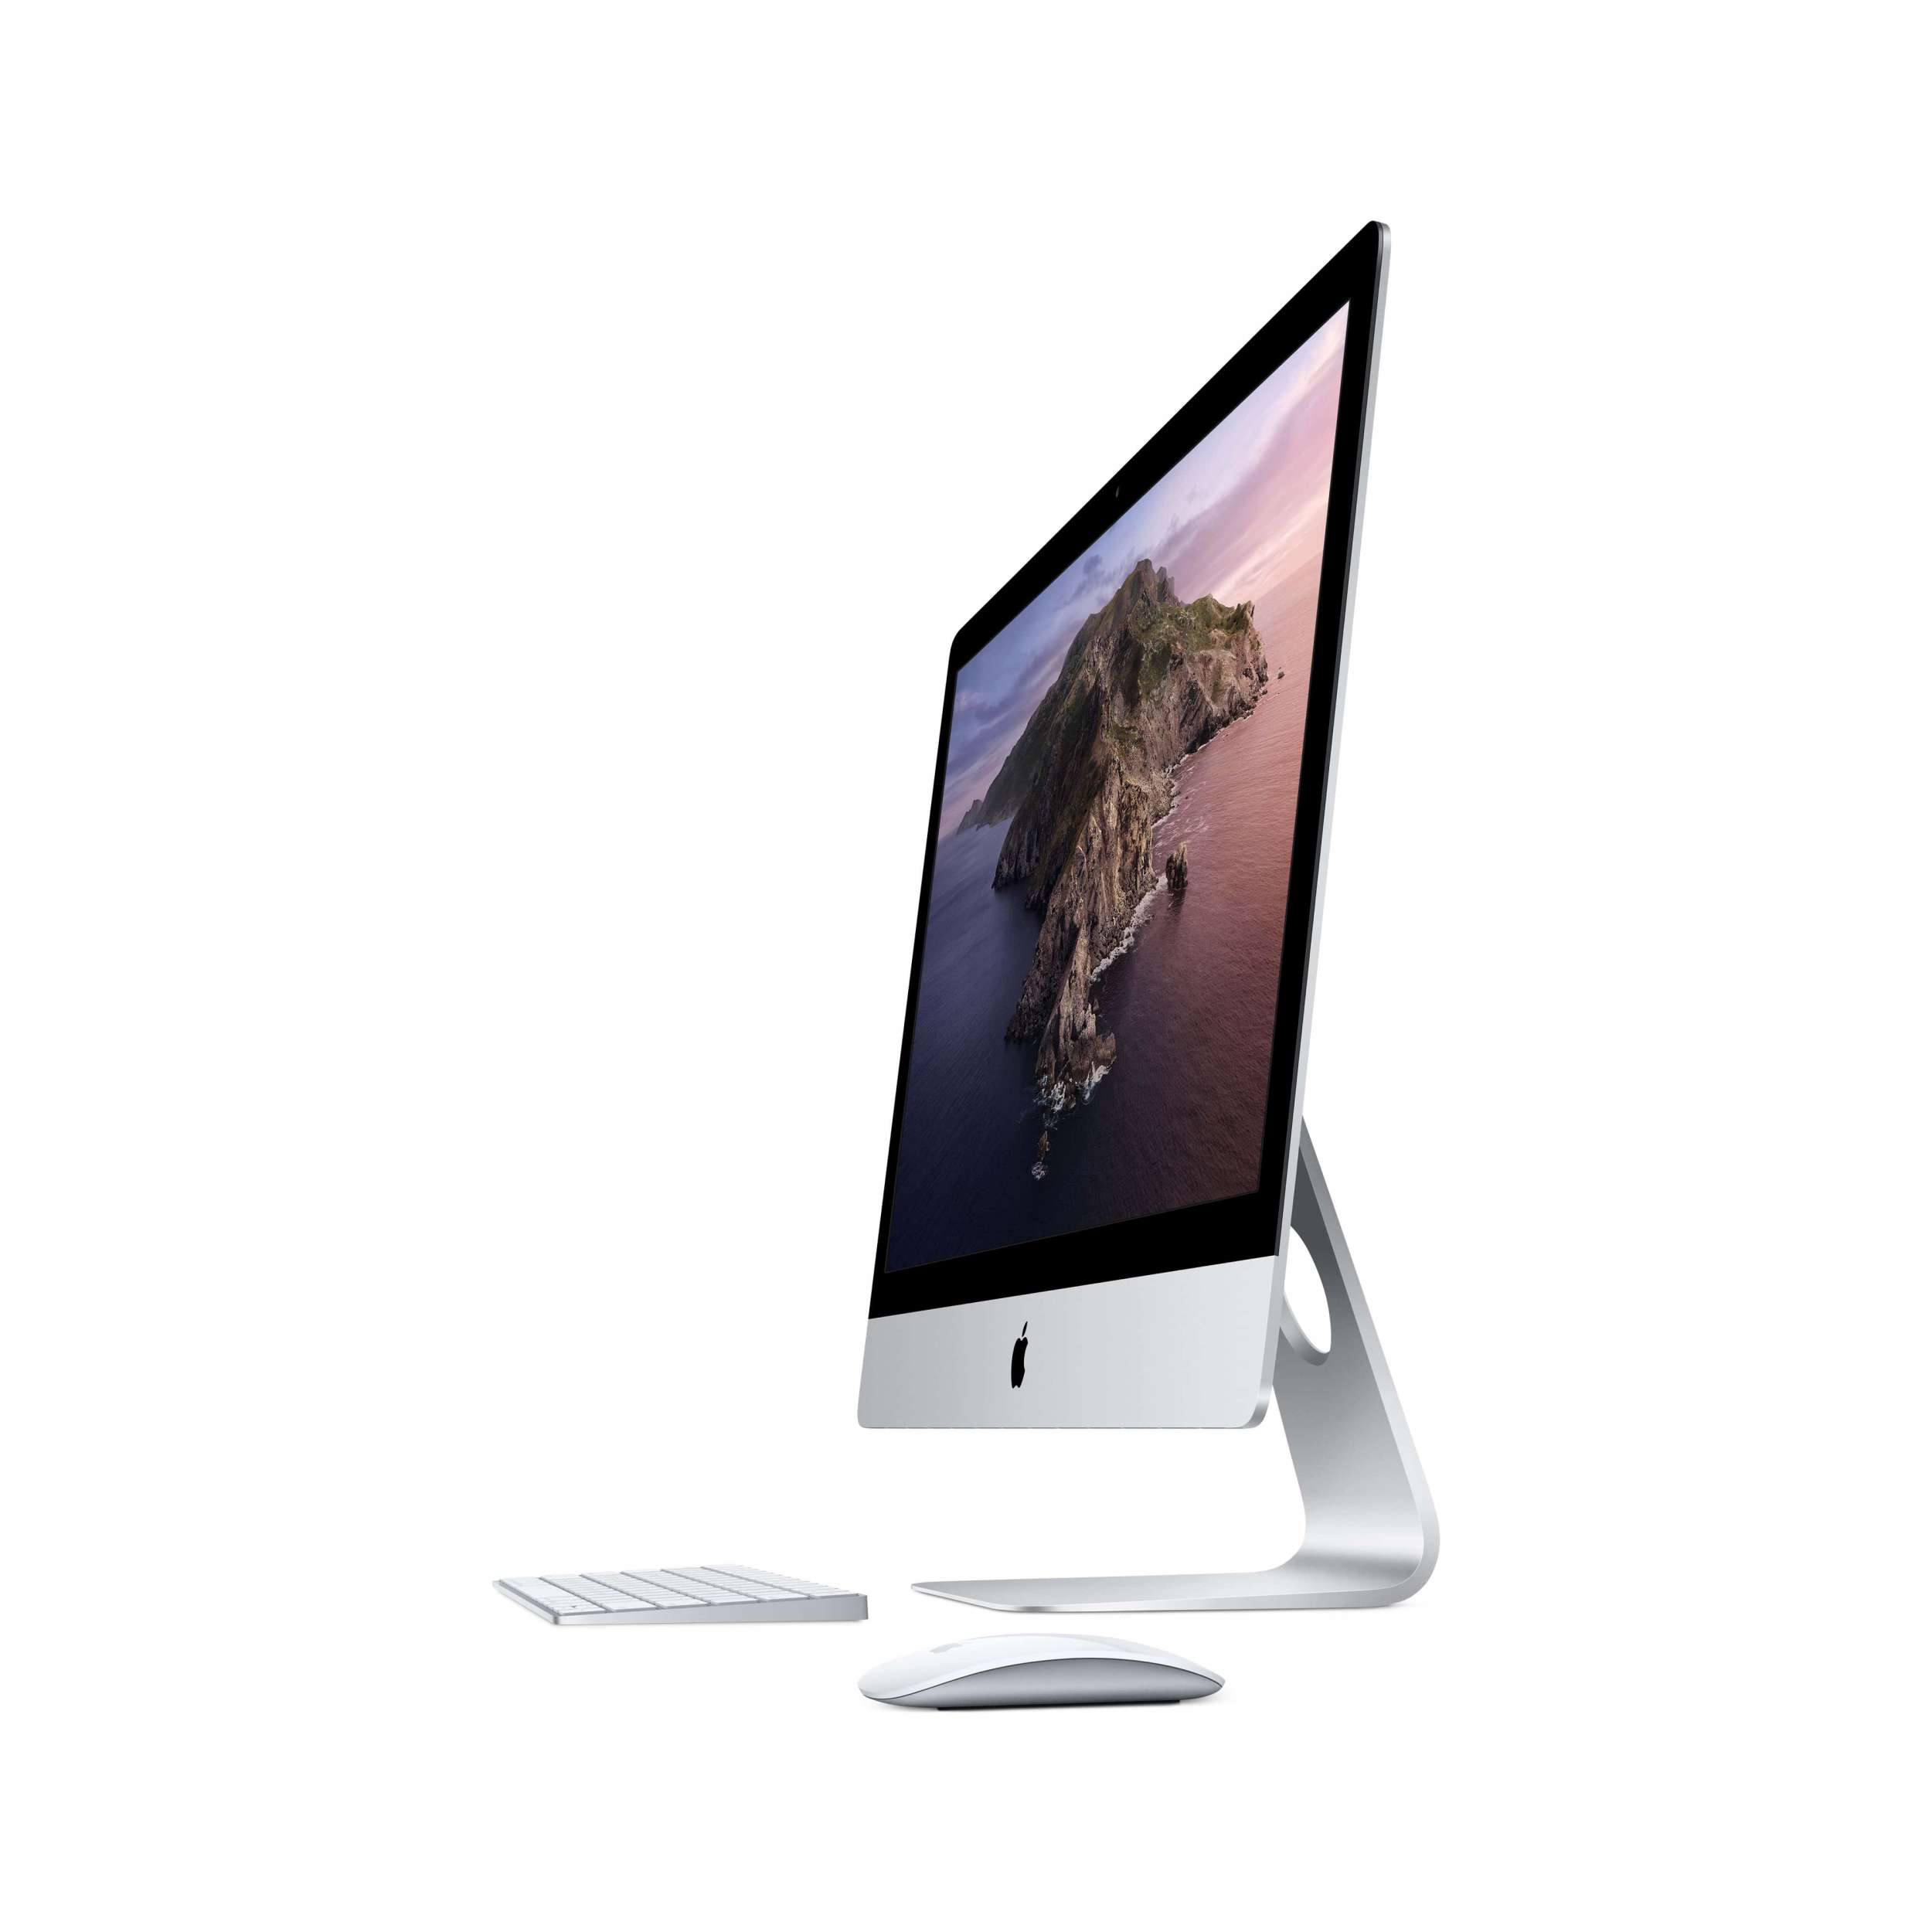 iMac 27 inç 5K 3.7GHz 6C i5 8GB RAM 2TB Fusion Drive 8GB Radeon Pro 580X MRR12TU/A